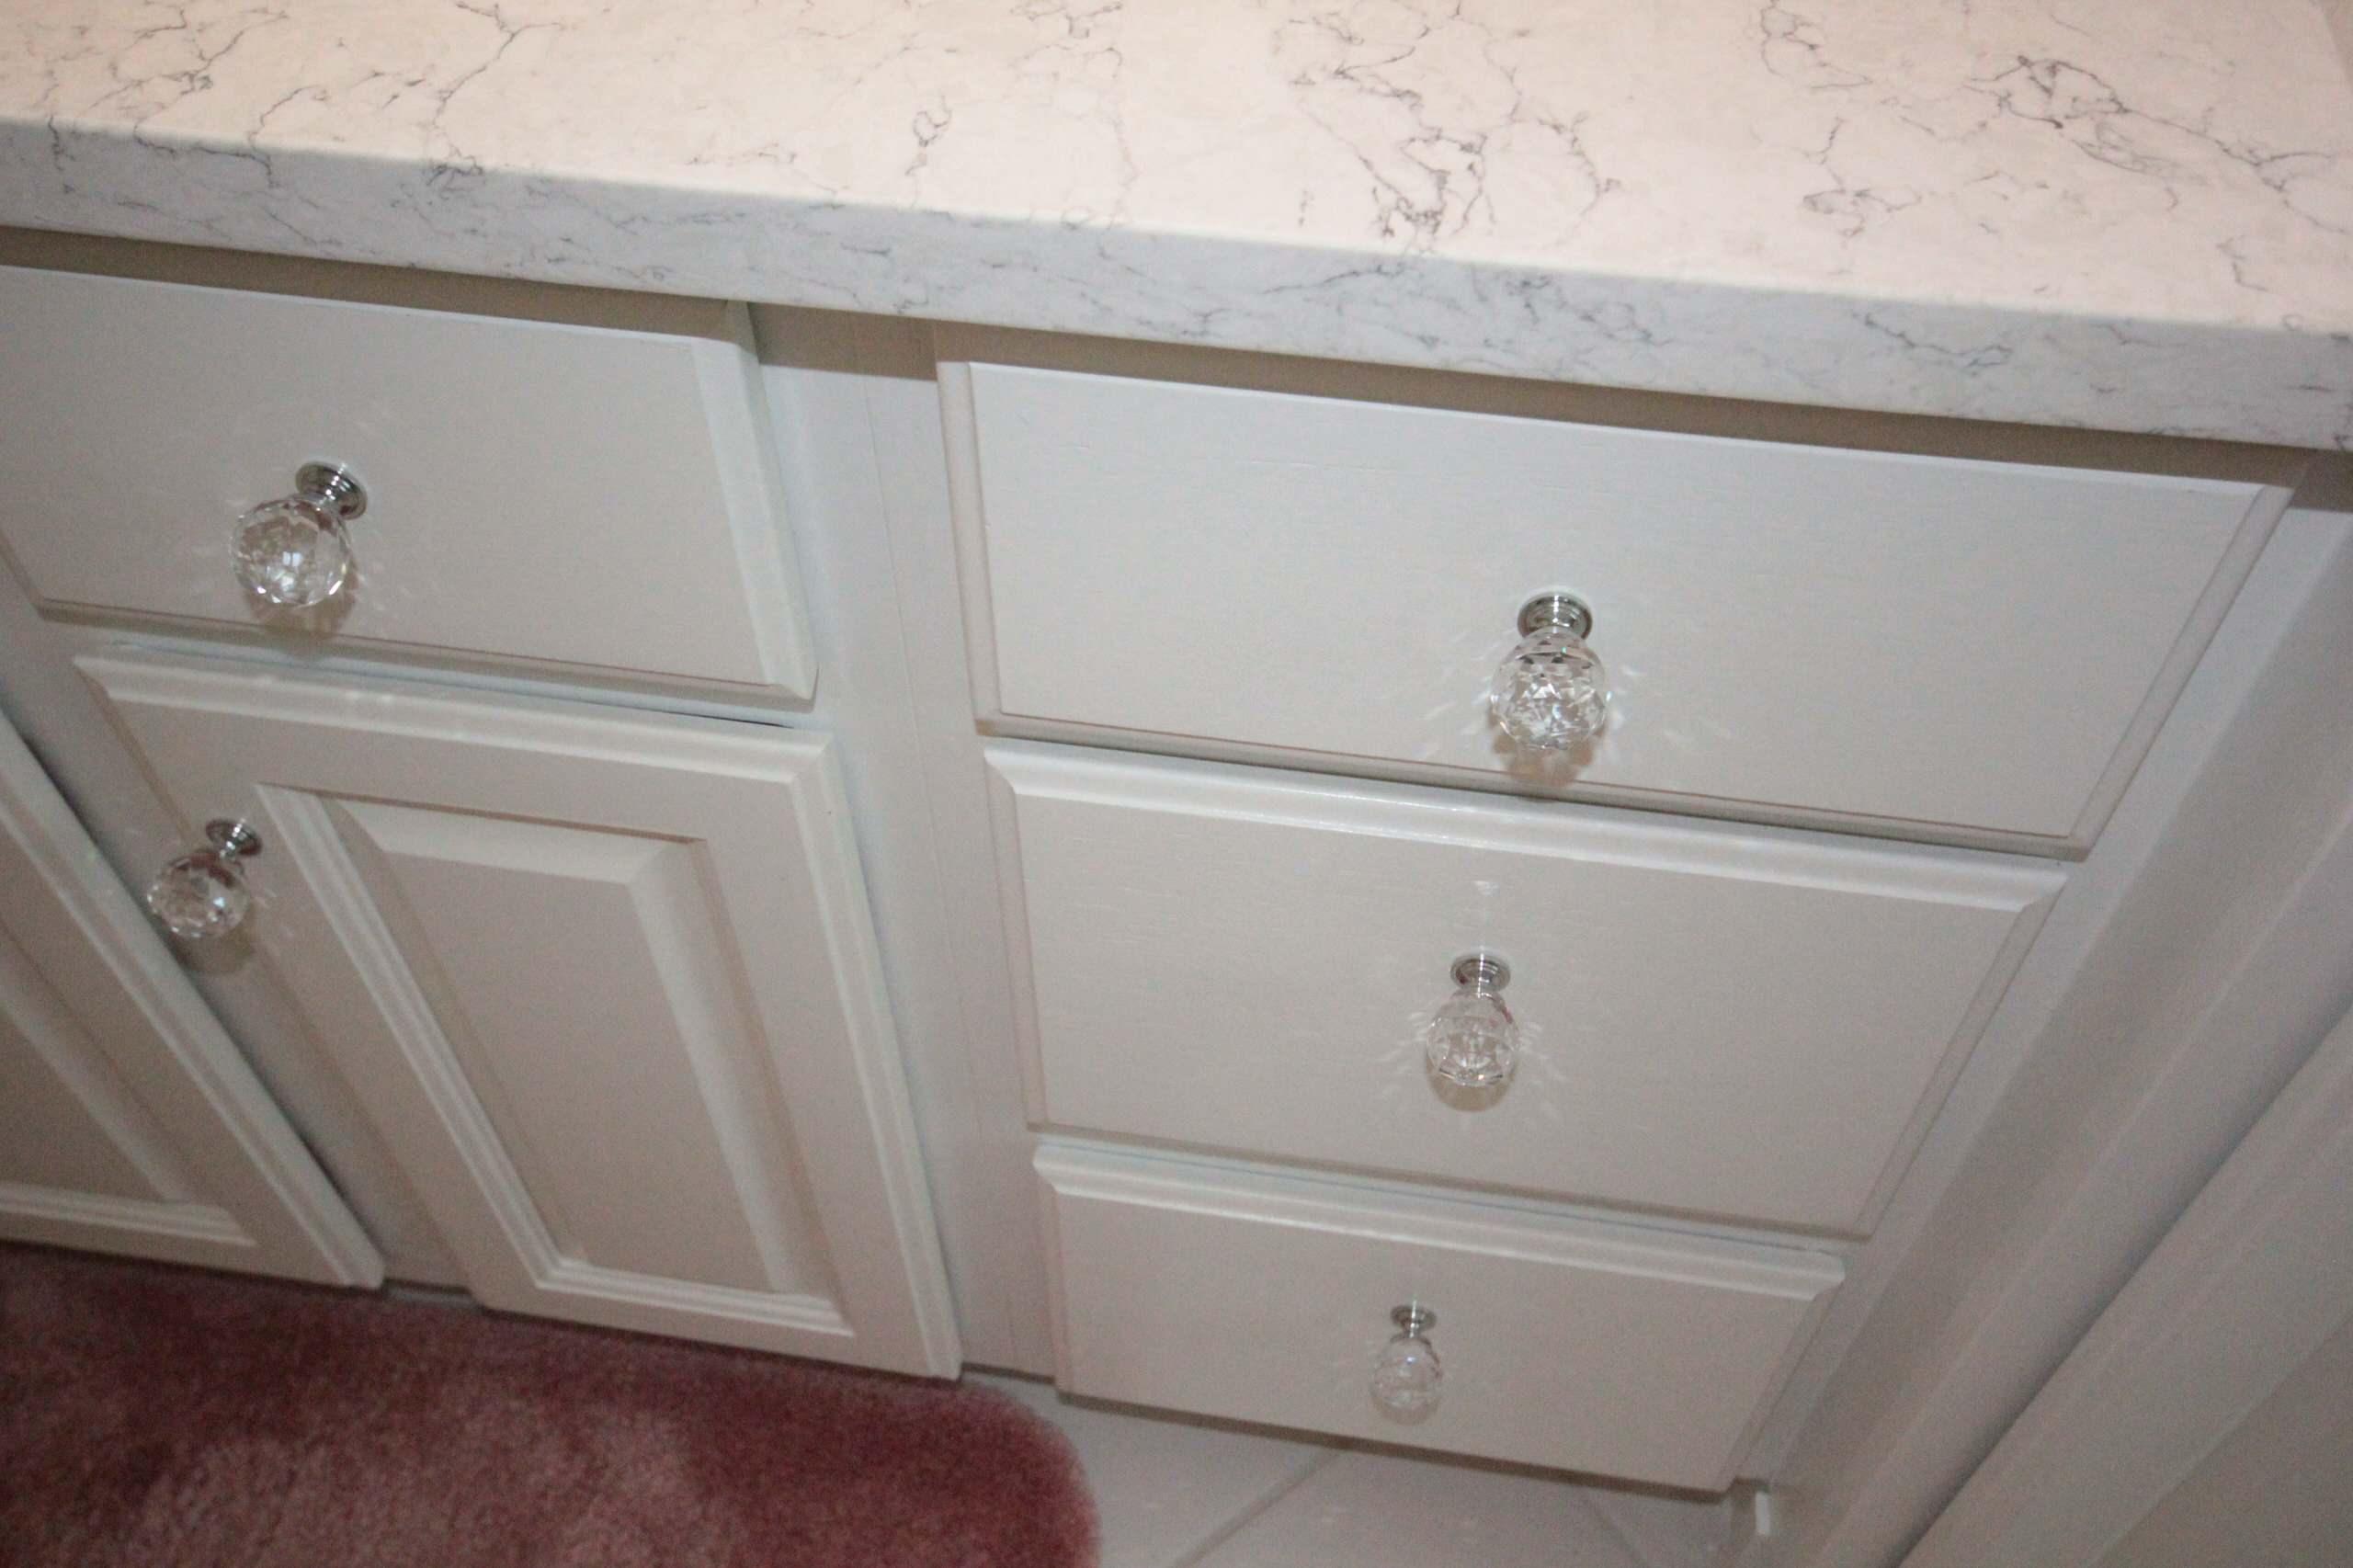 Crystal knobs.